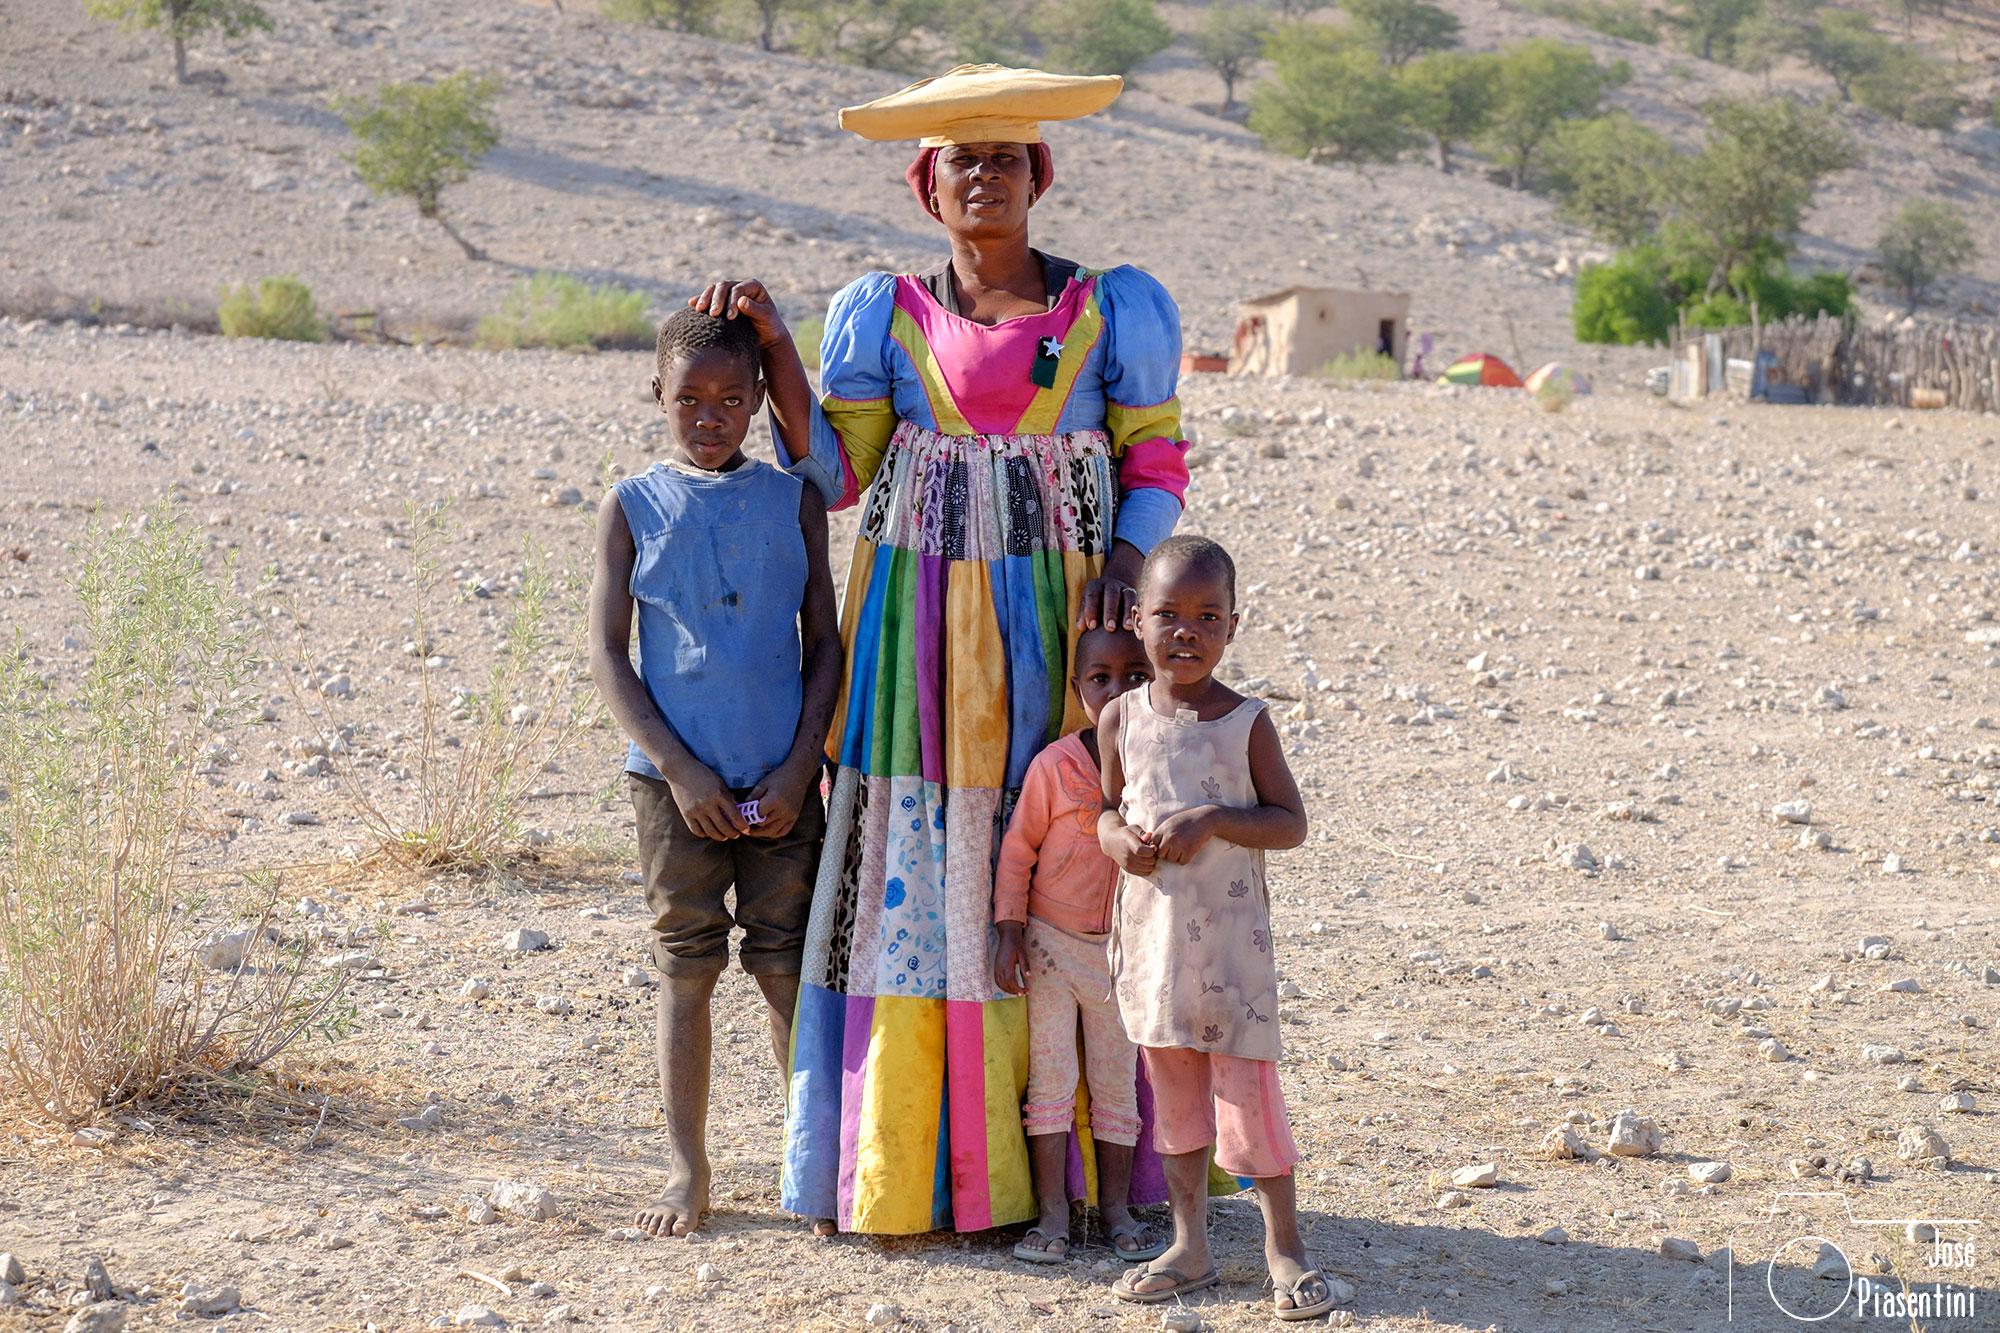 People-of-Namibia